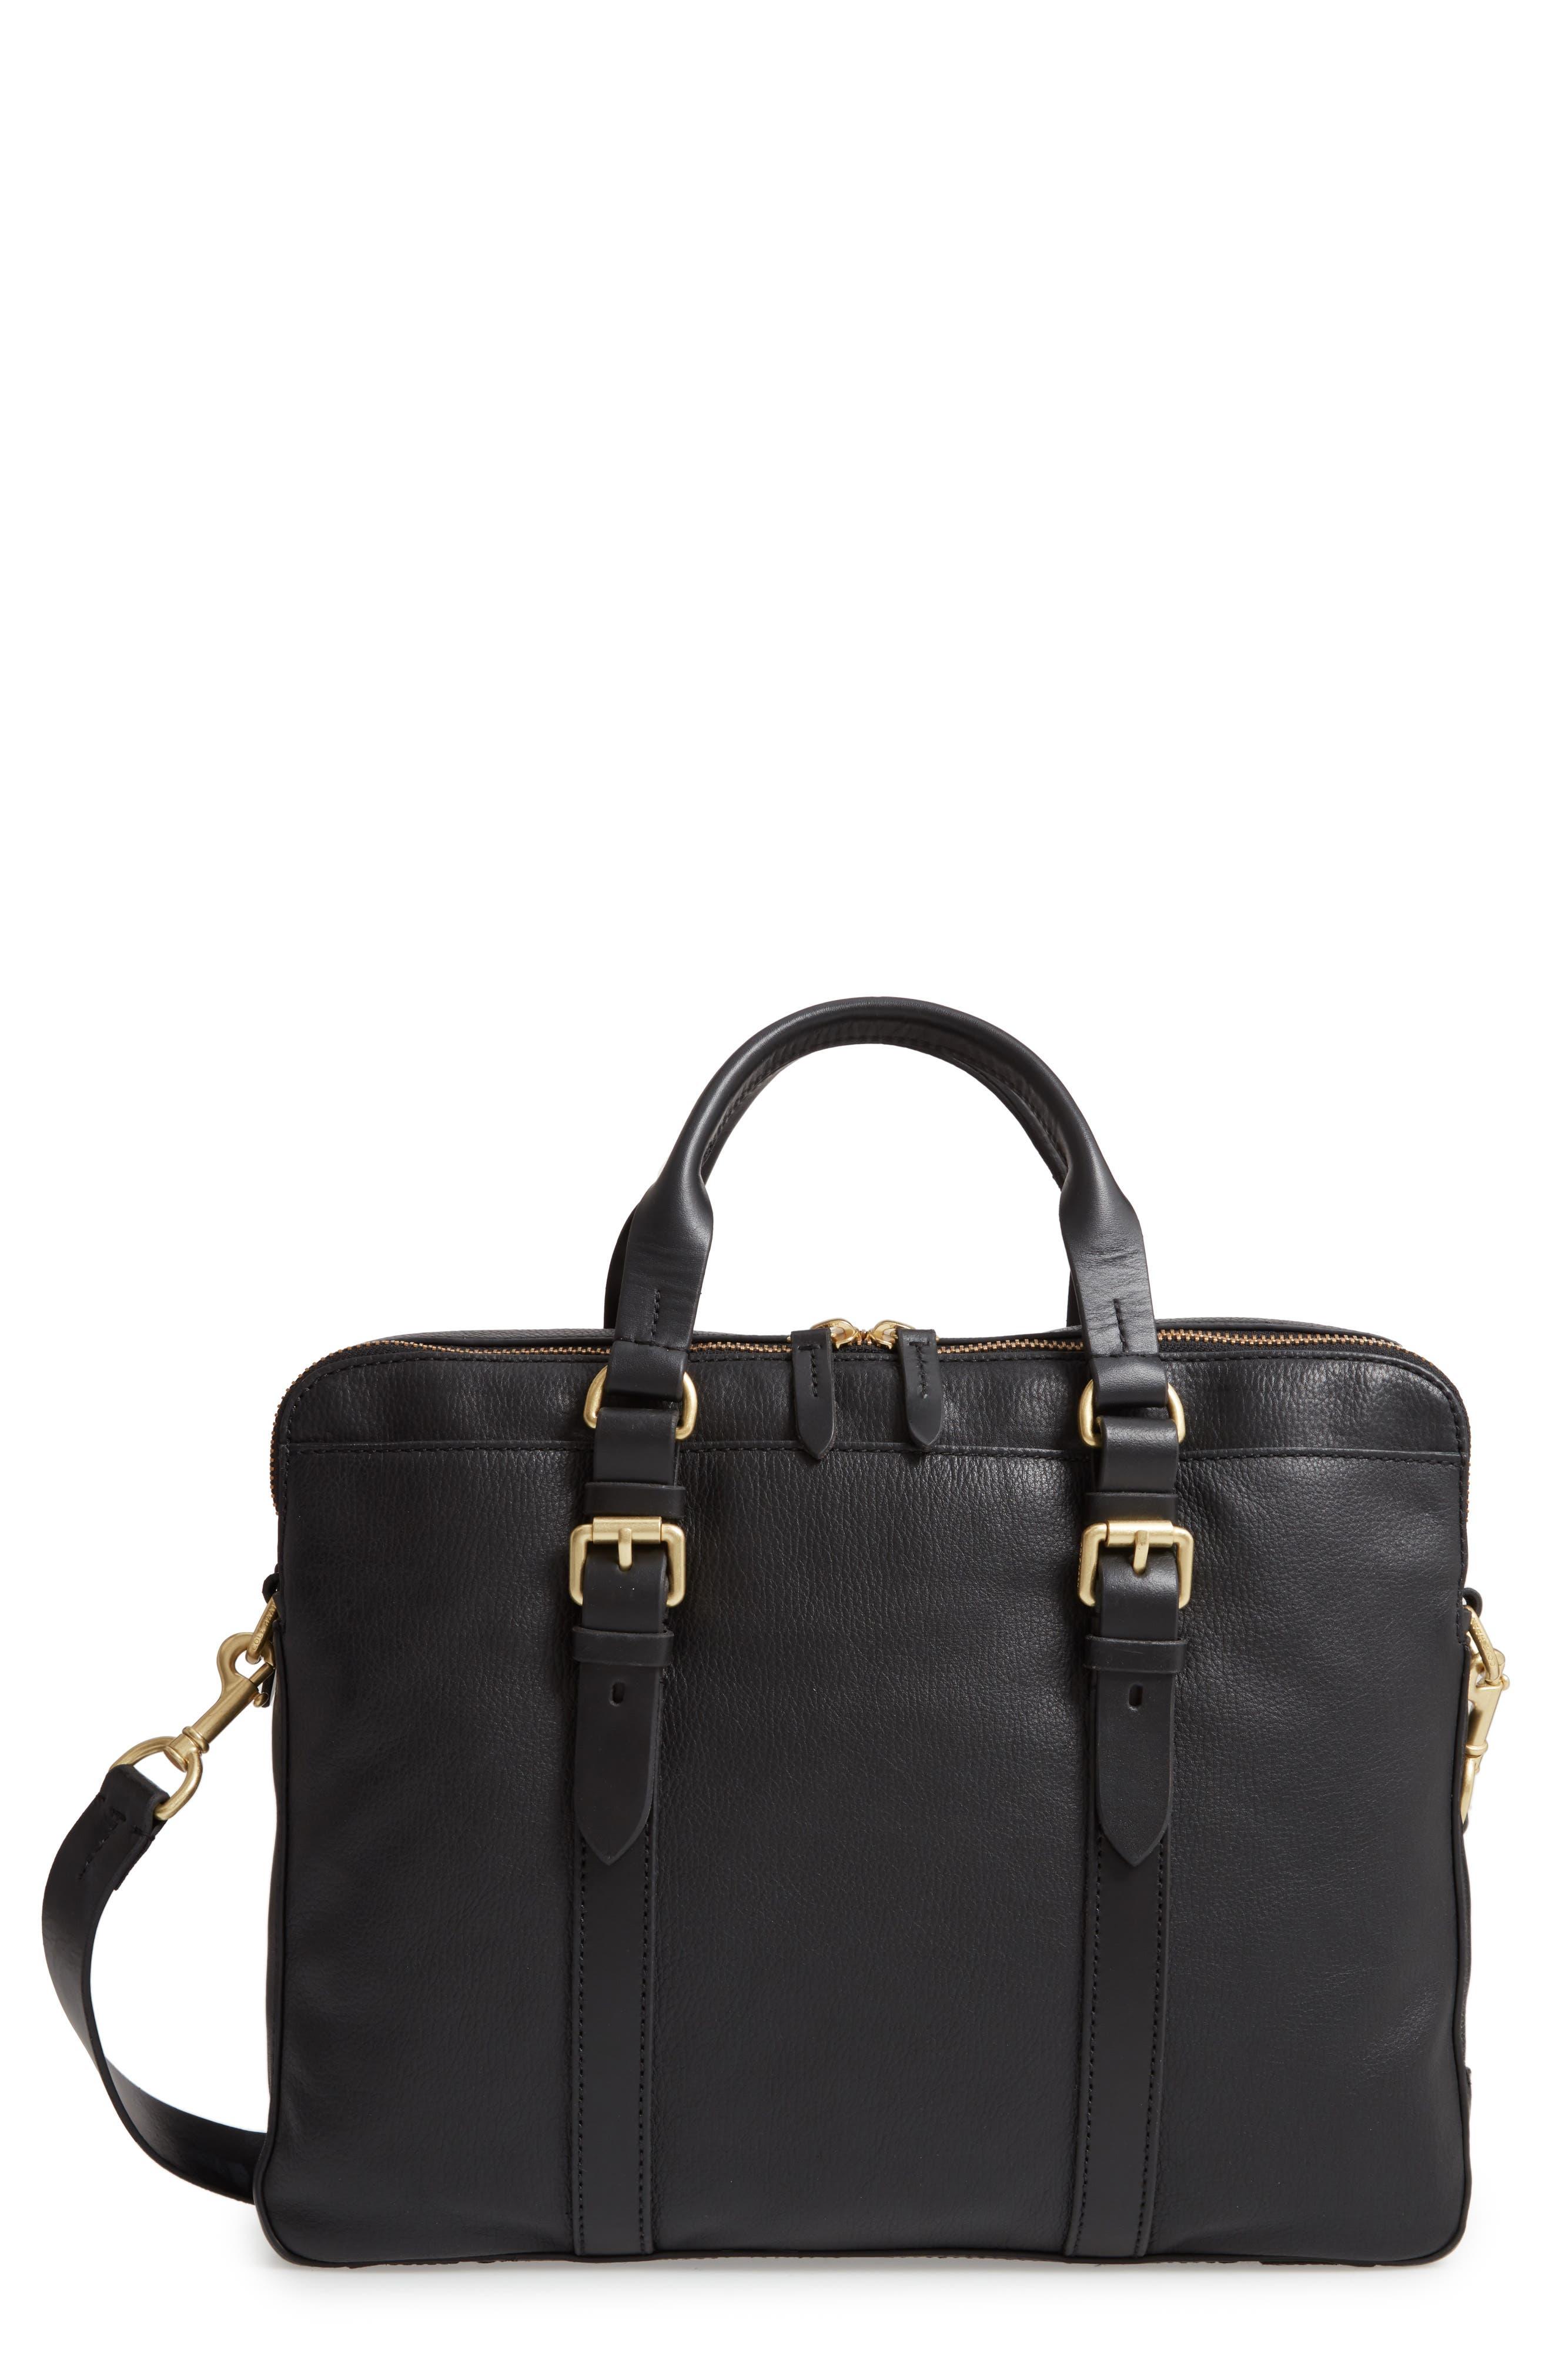 COLE HAAN Matthews Attache Briefcase, Main, color, 001